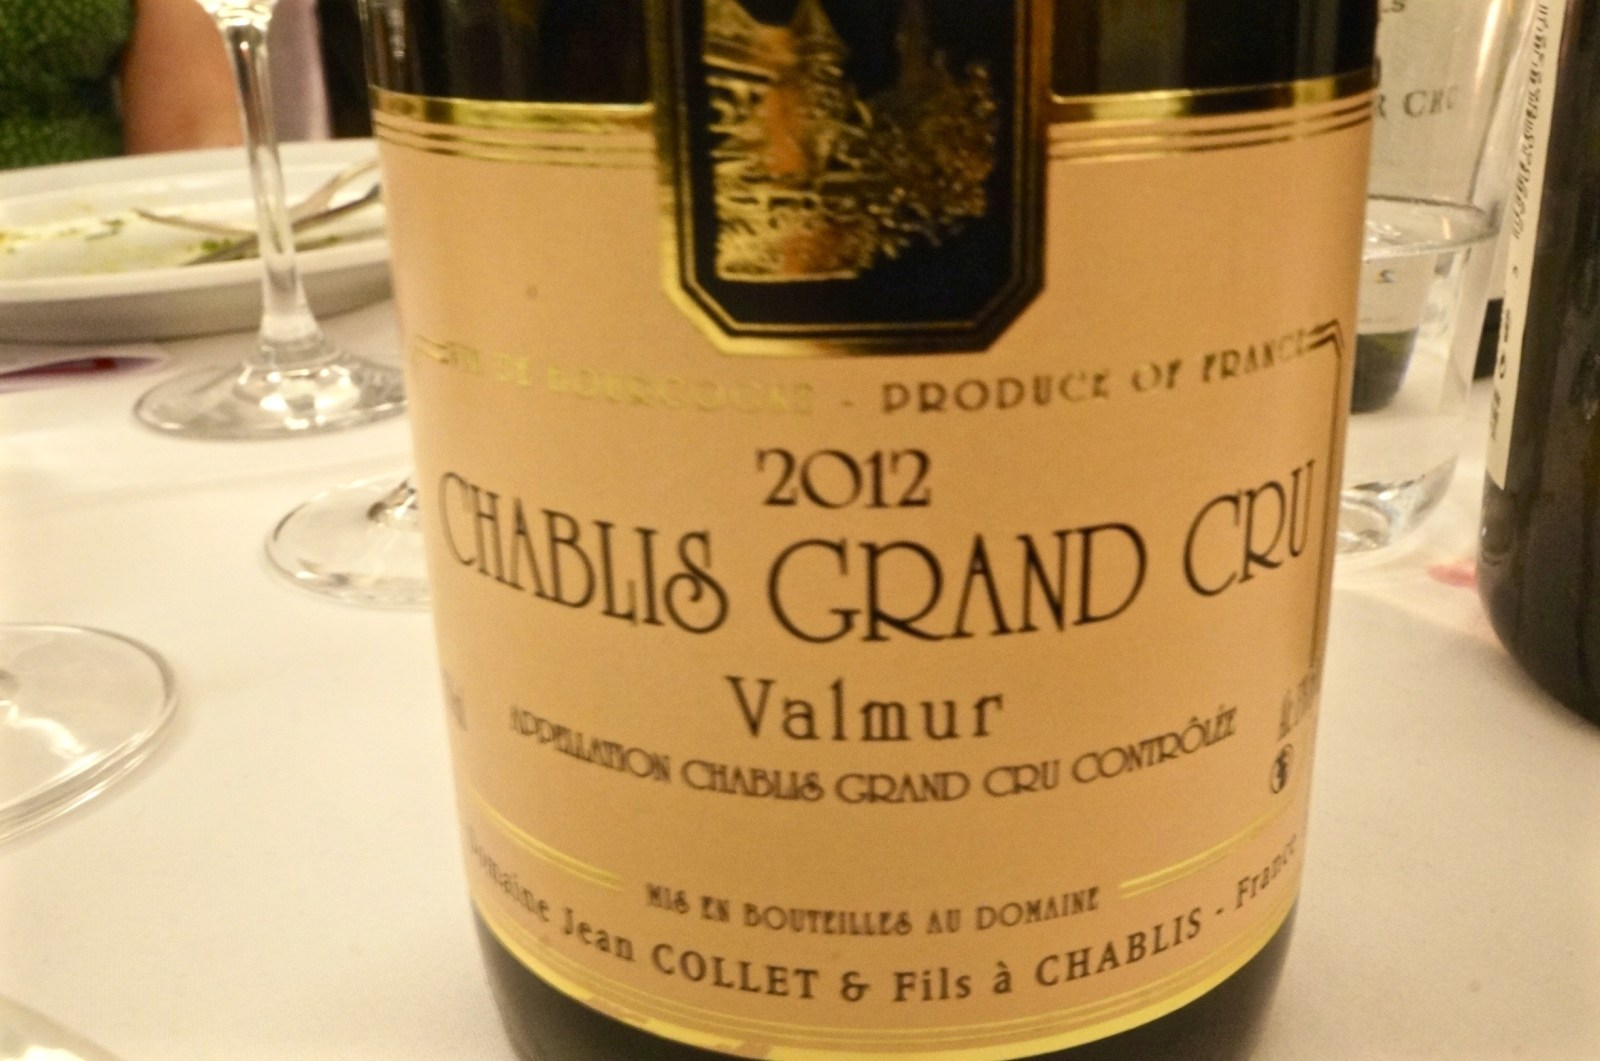 Chablis Grand Cru Valmud Jean Collet 2012